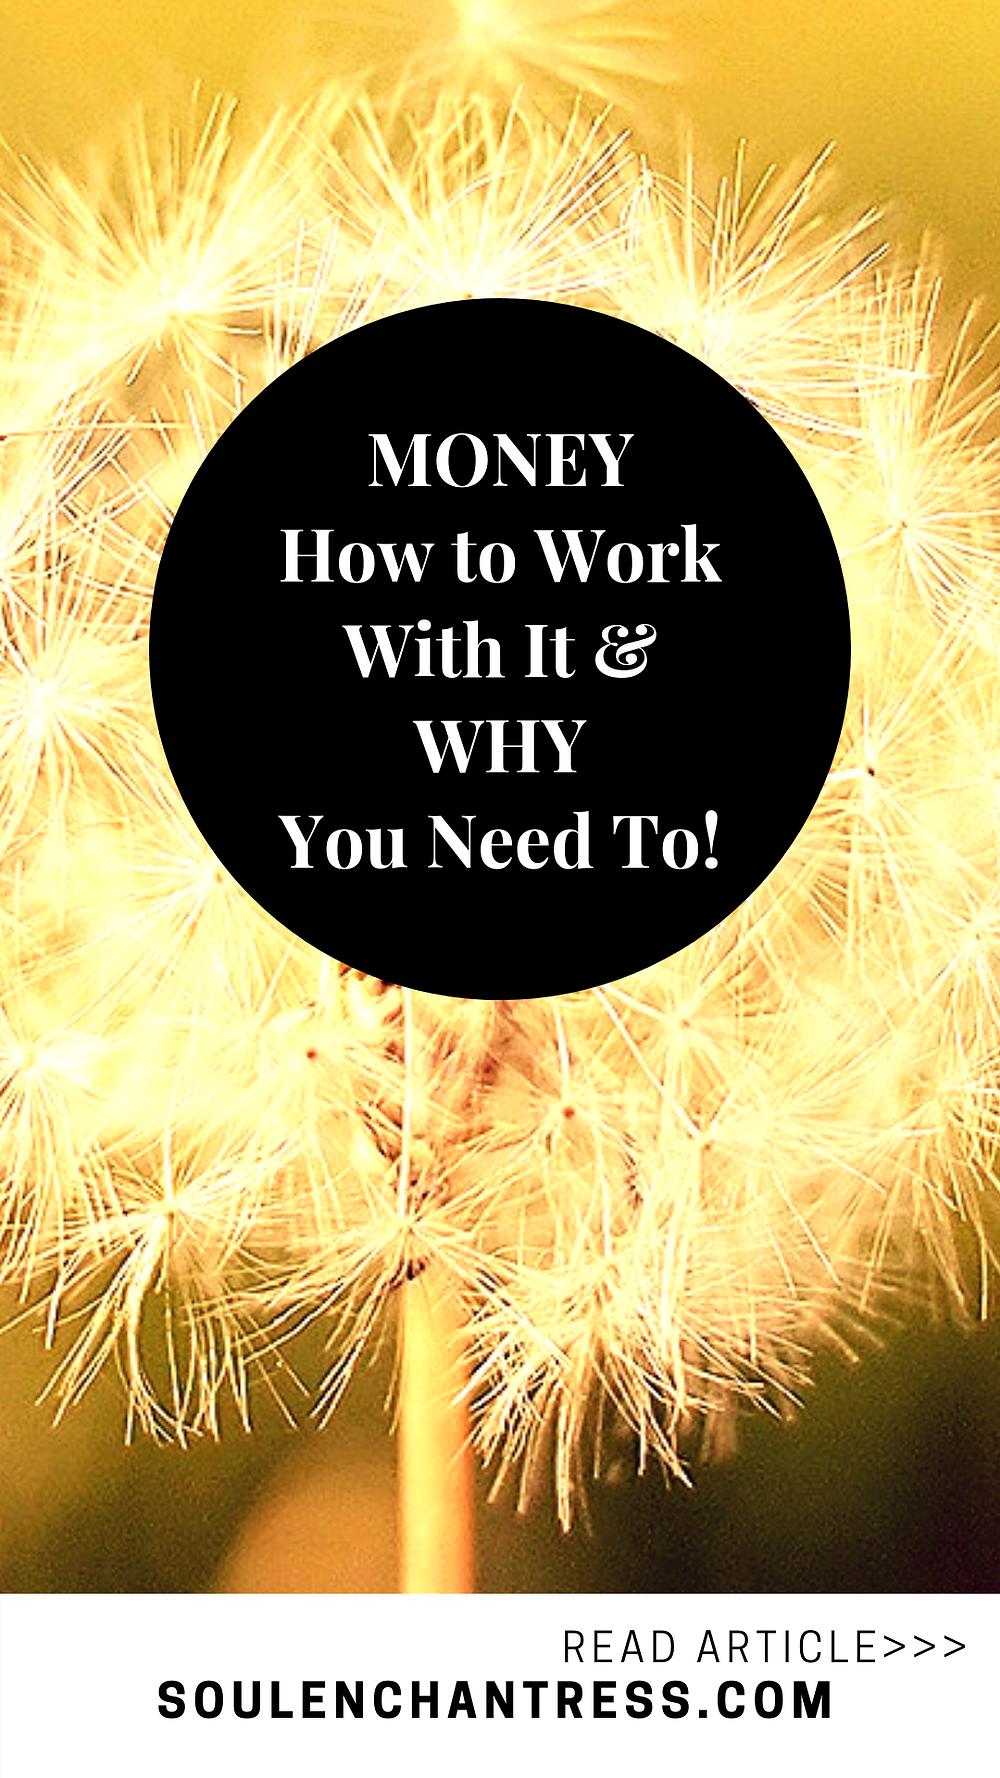 how to make money, how to love money, money mindset tips, money blocks, money energy, money spells, soul enchantress, how to attract money, how to earn money